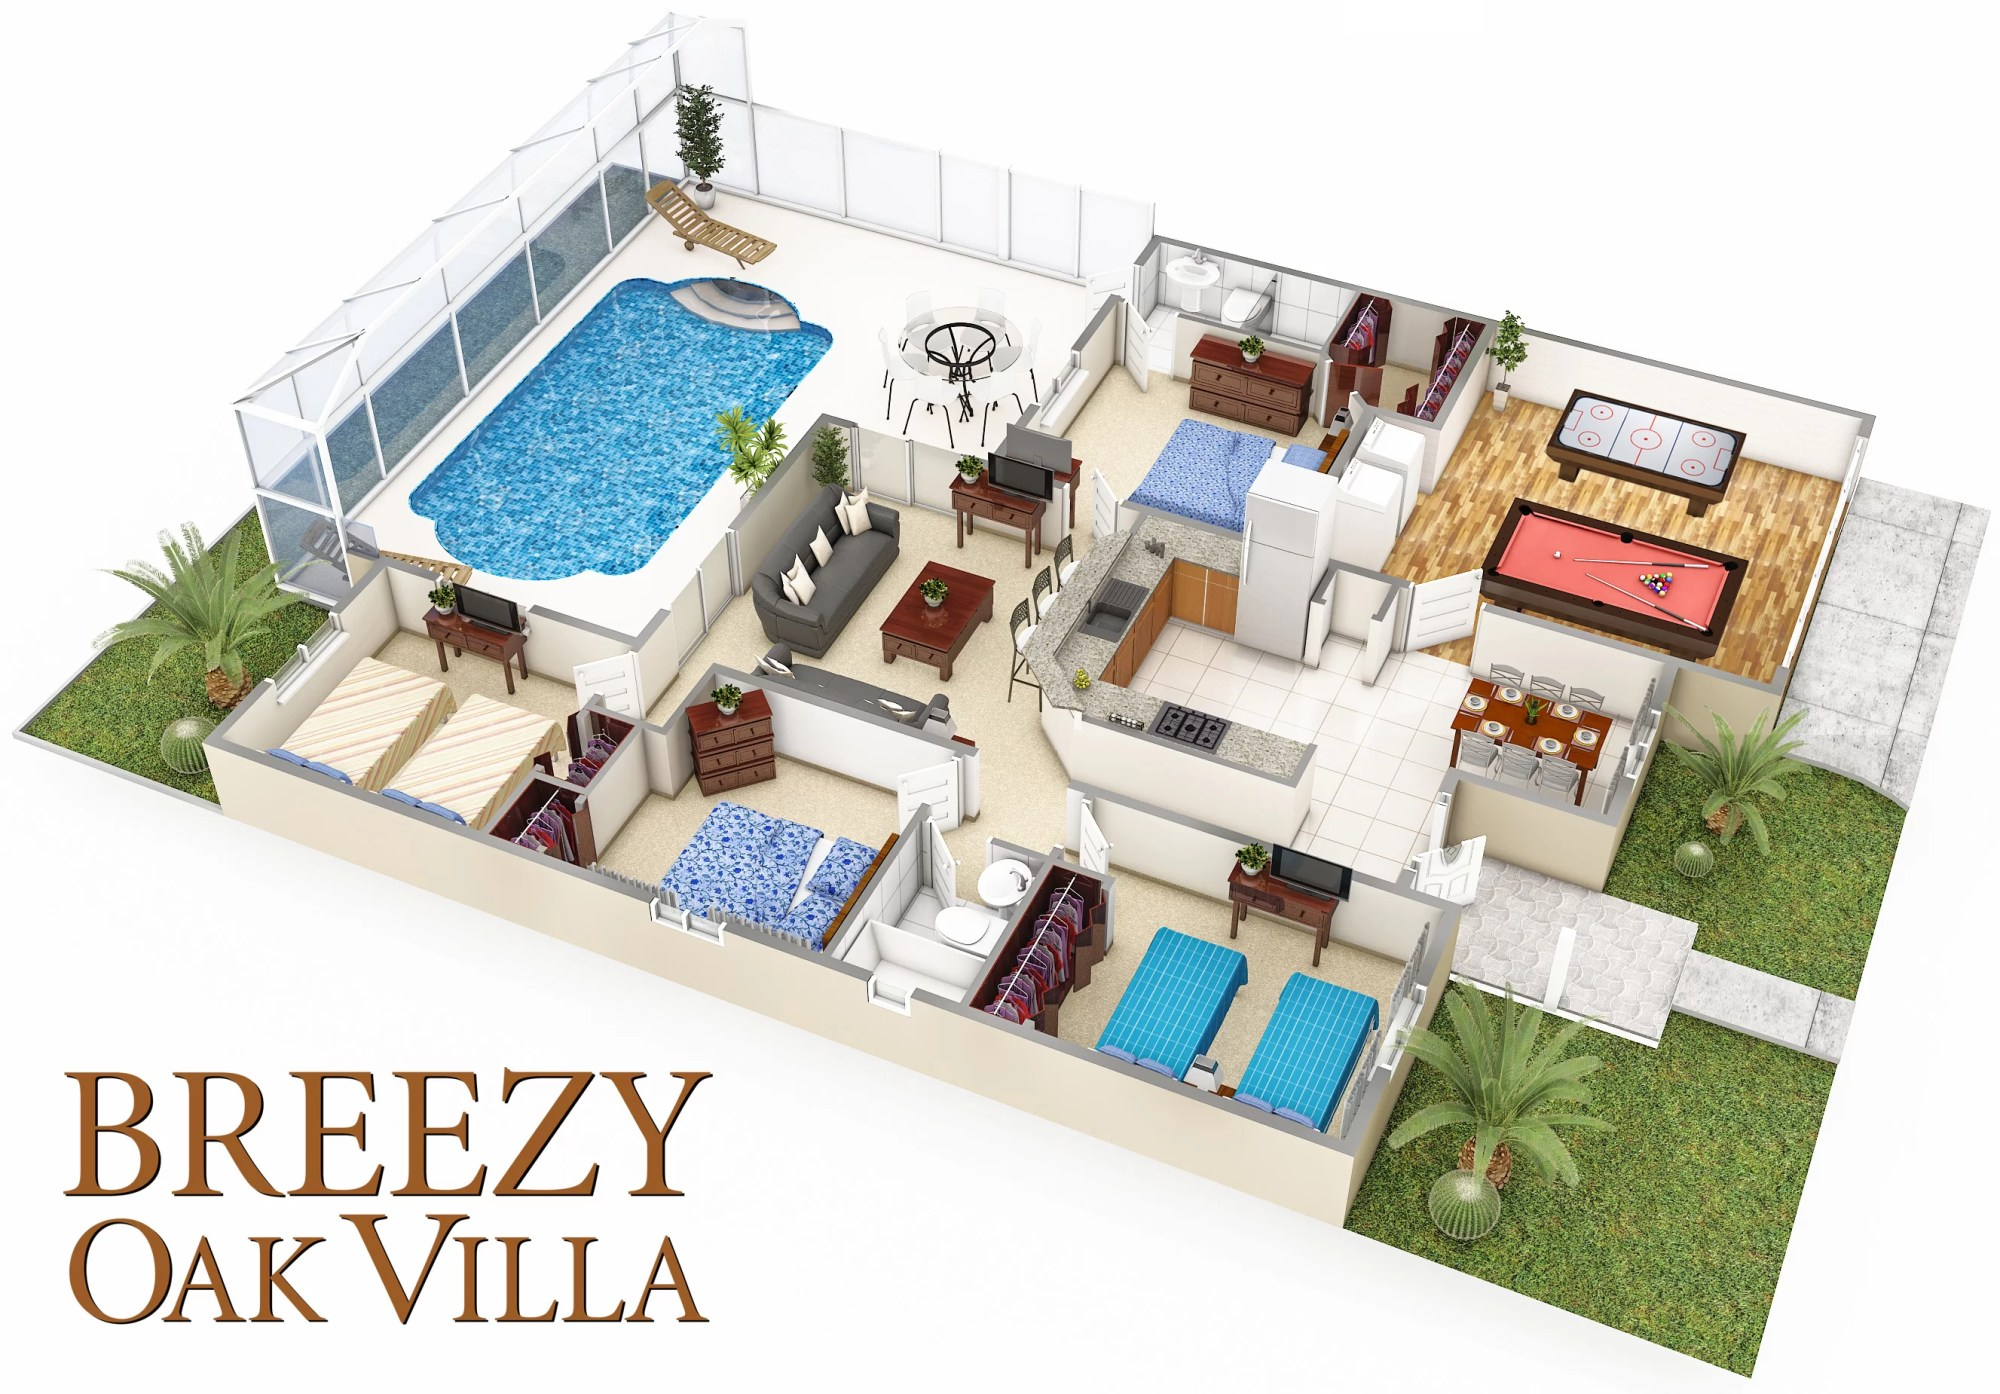 Breezy Oak Villa